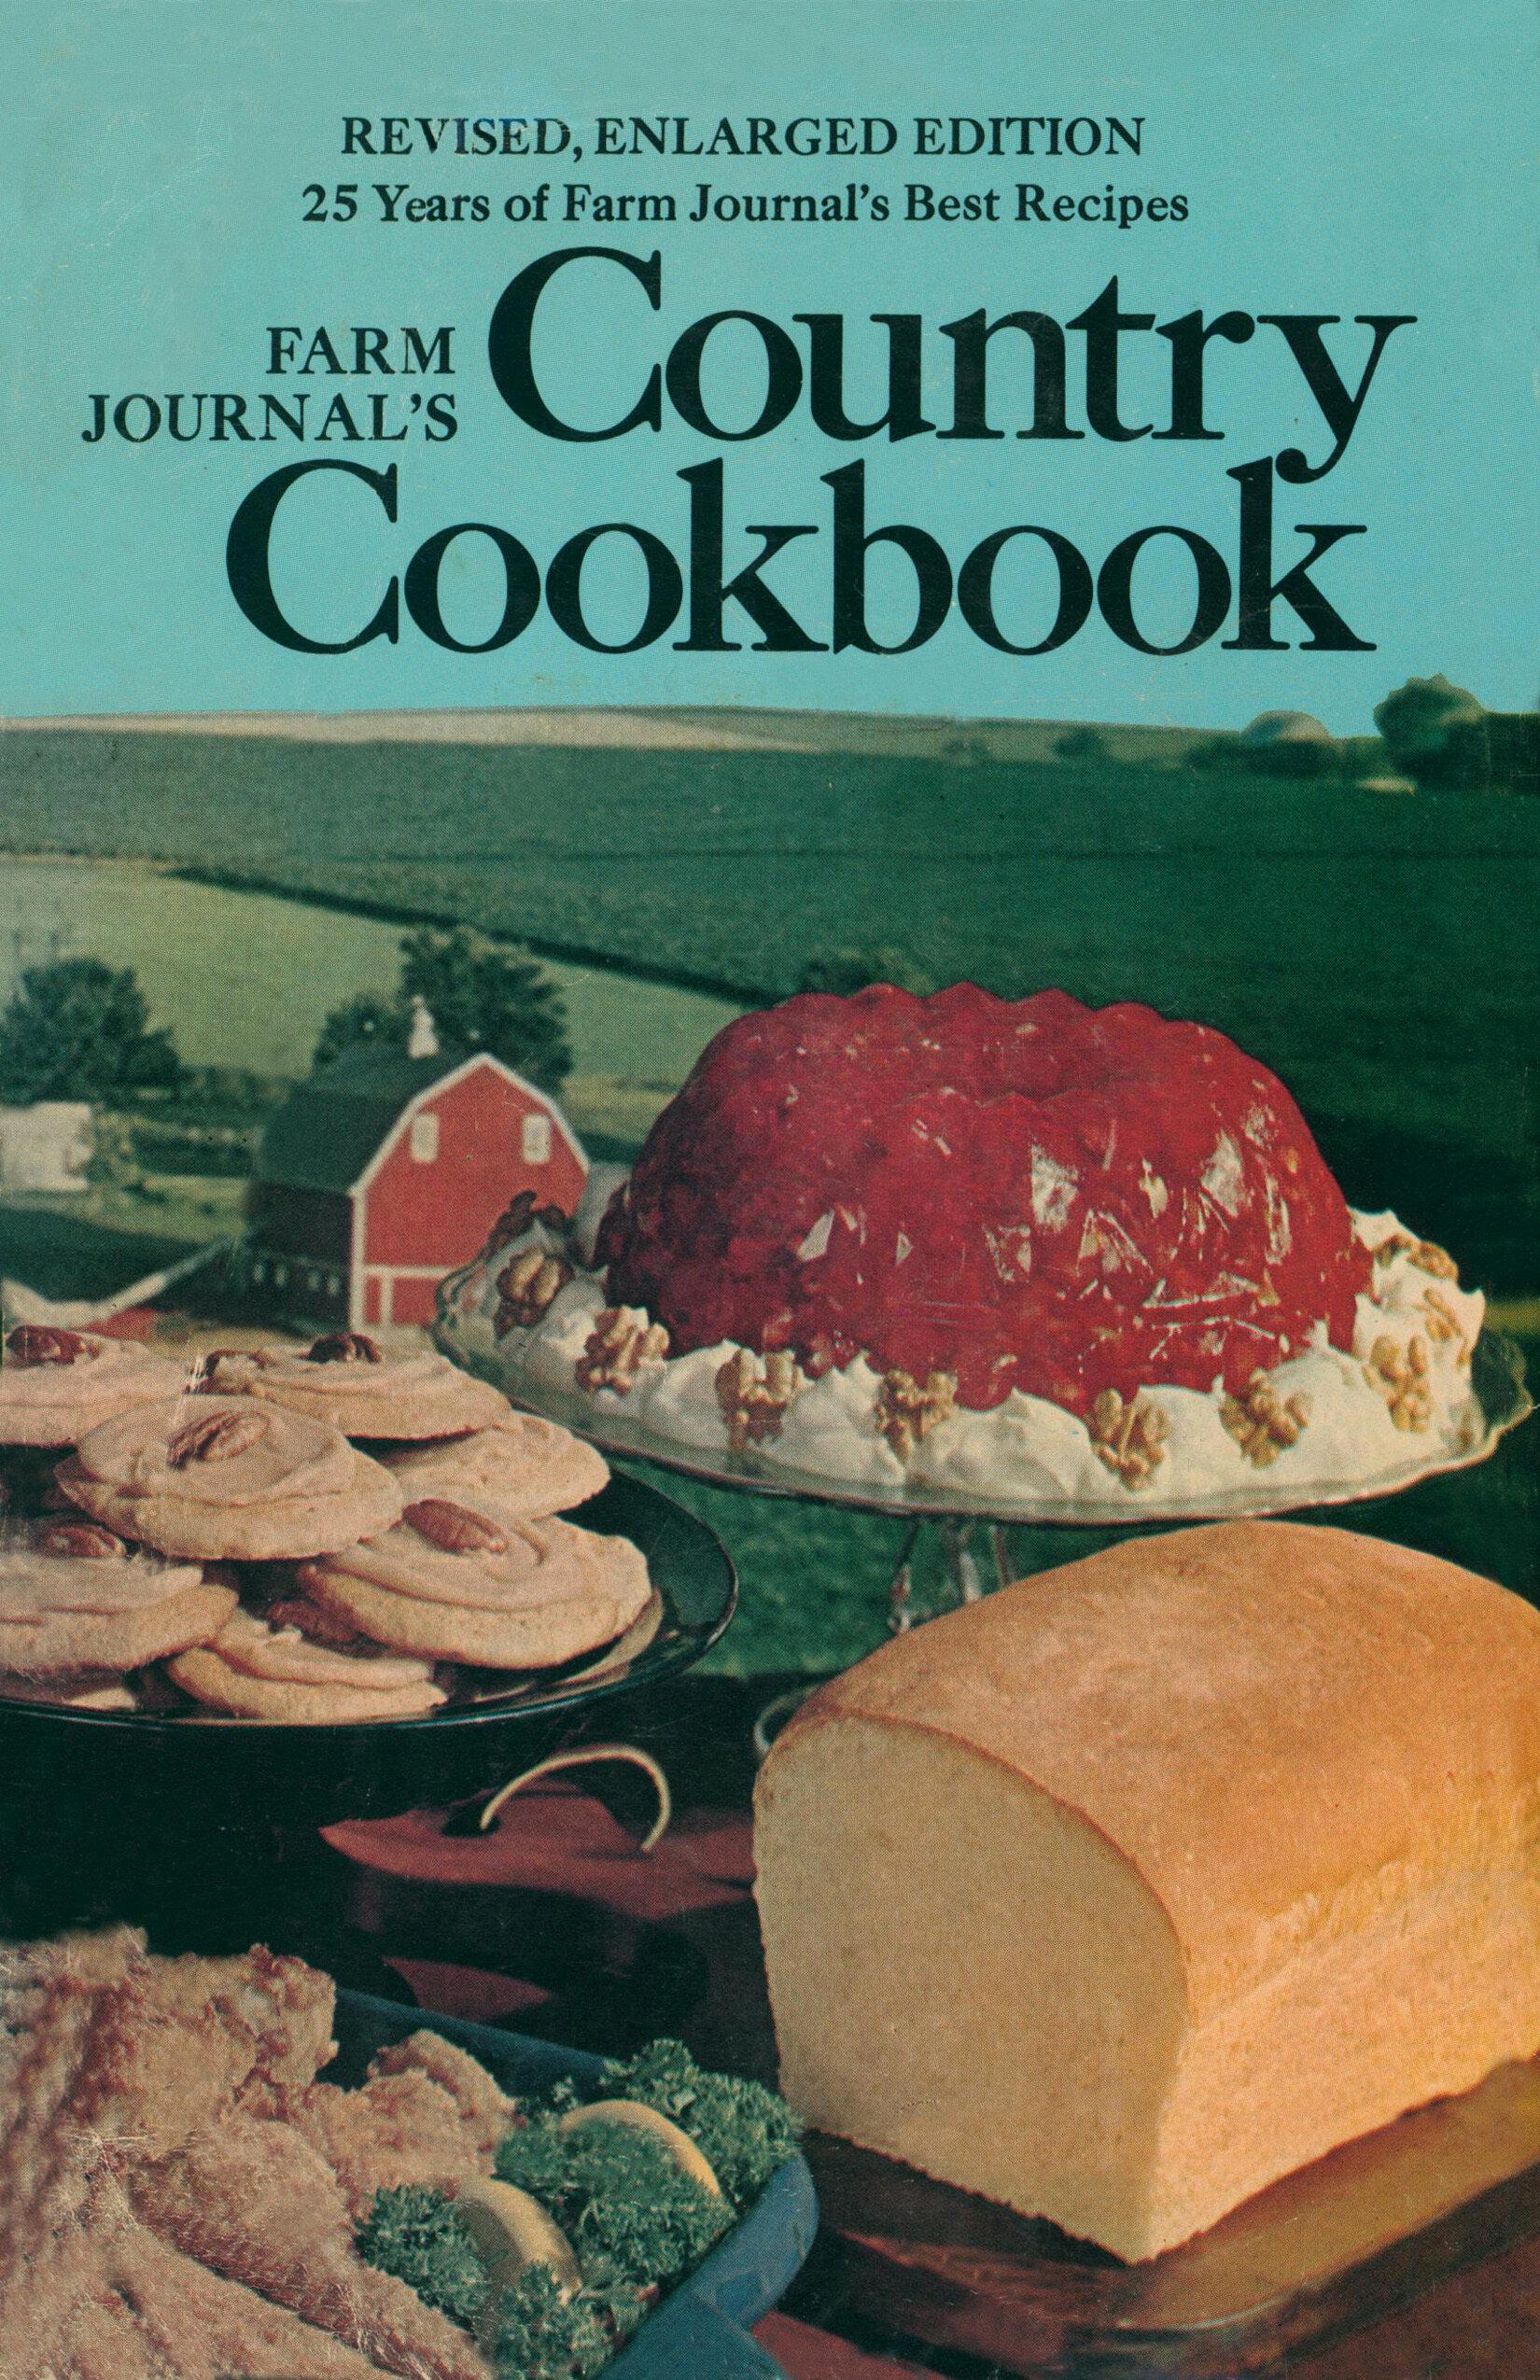 Farm Journal - Farm Journal's Country Cookbook - 9780385030366.jpg